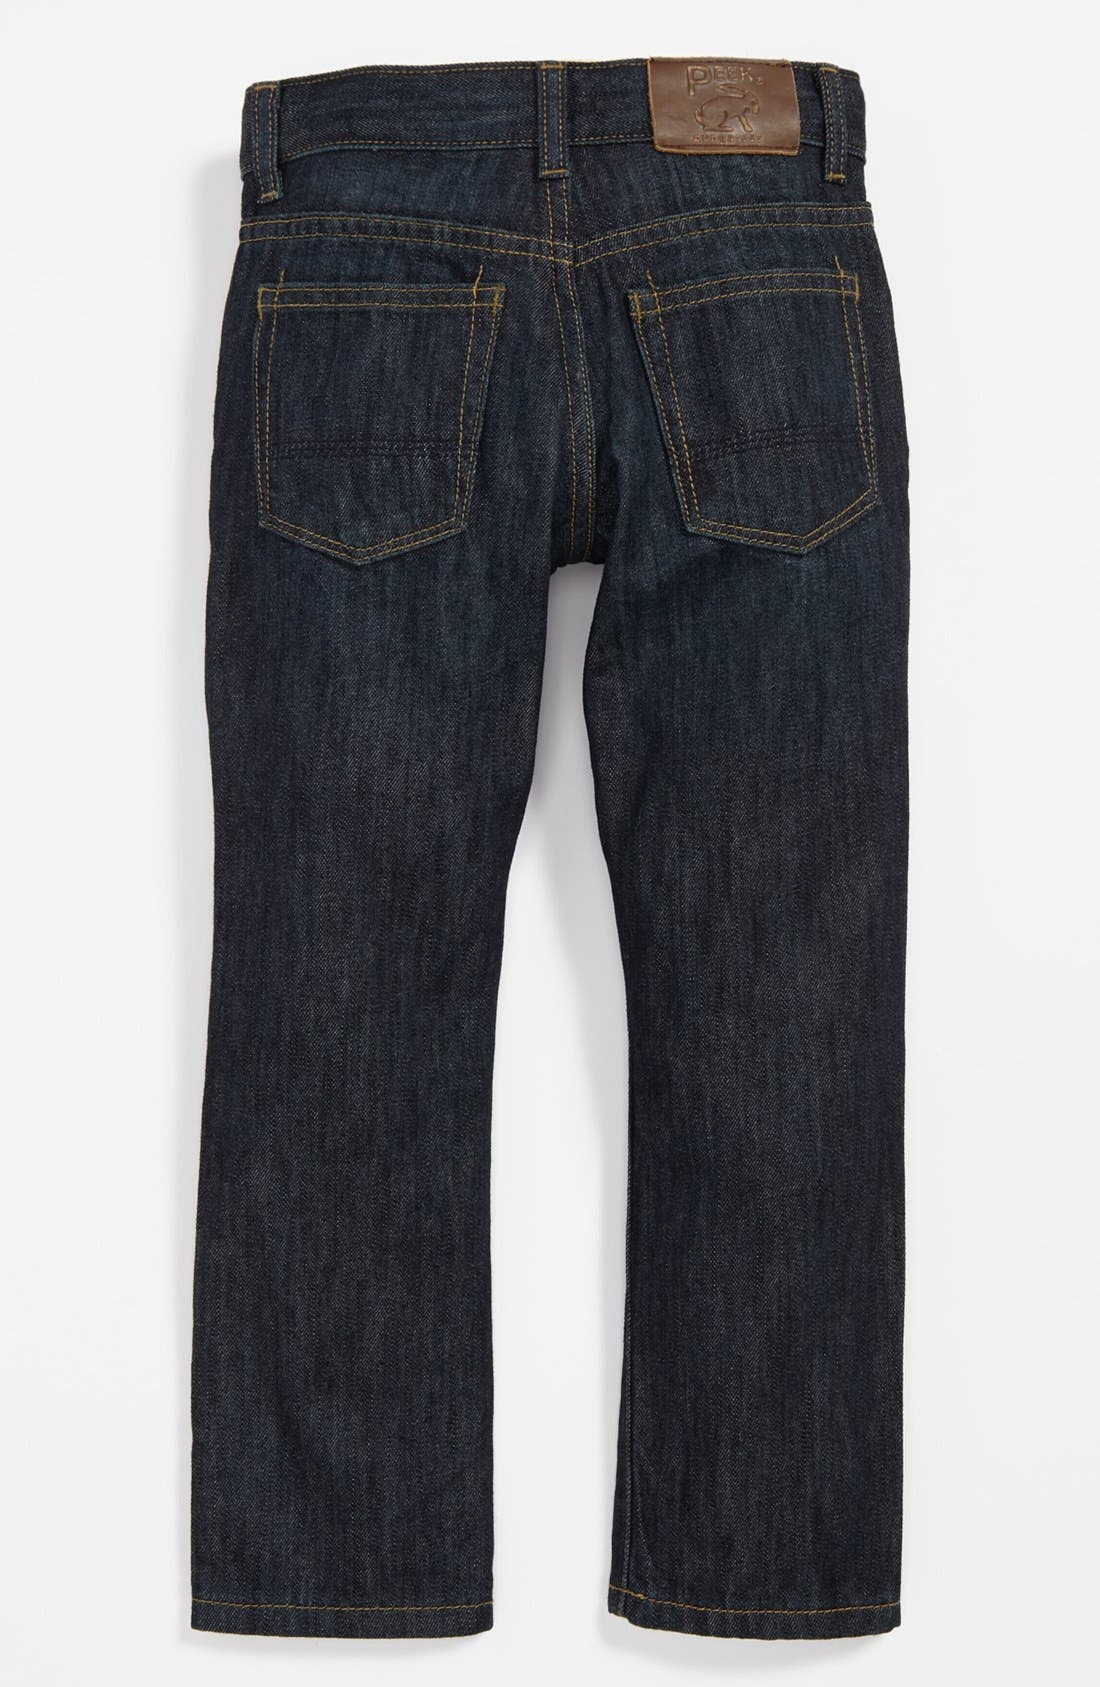 Main Image - Peek 'Slouch' Jeans (Toddler Boys, Little Boys & Big Boys)